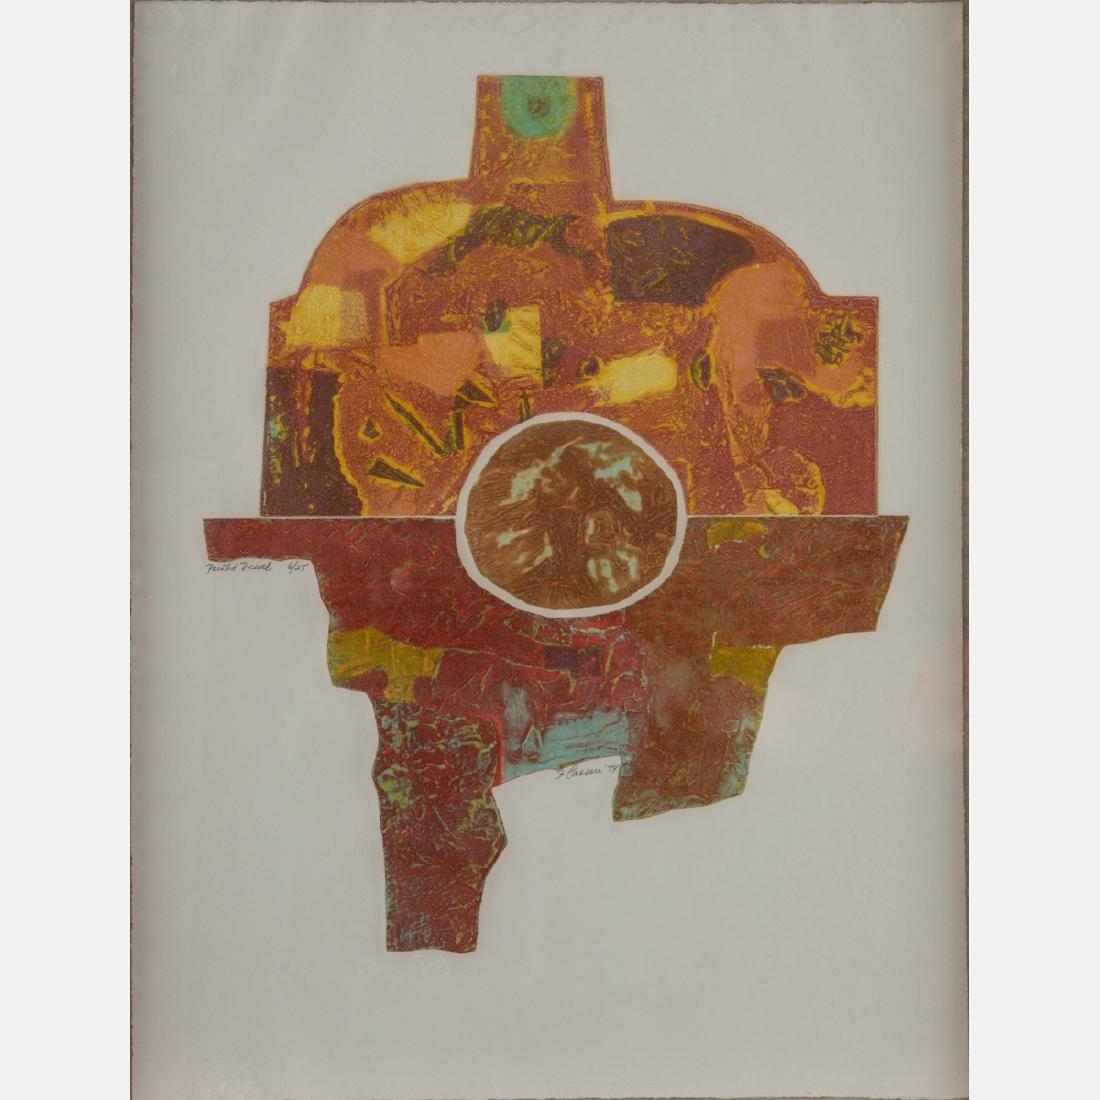 Frank Cassara (b. 1913) Painted Vessel, 1974,